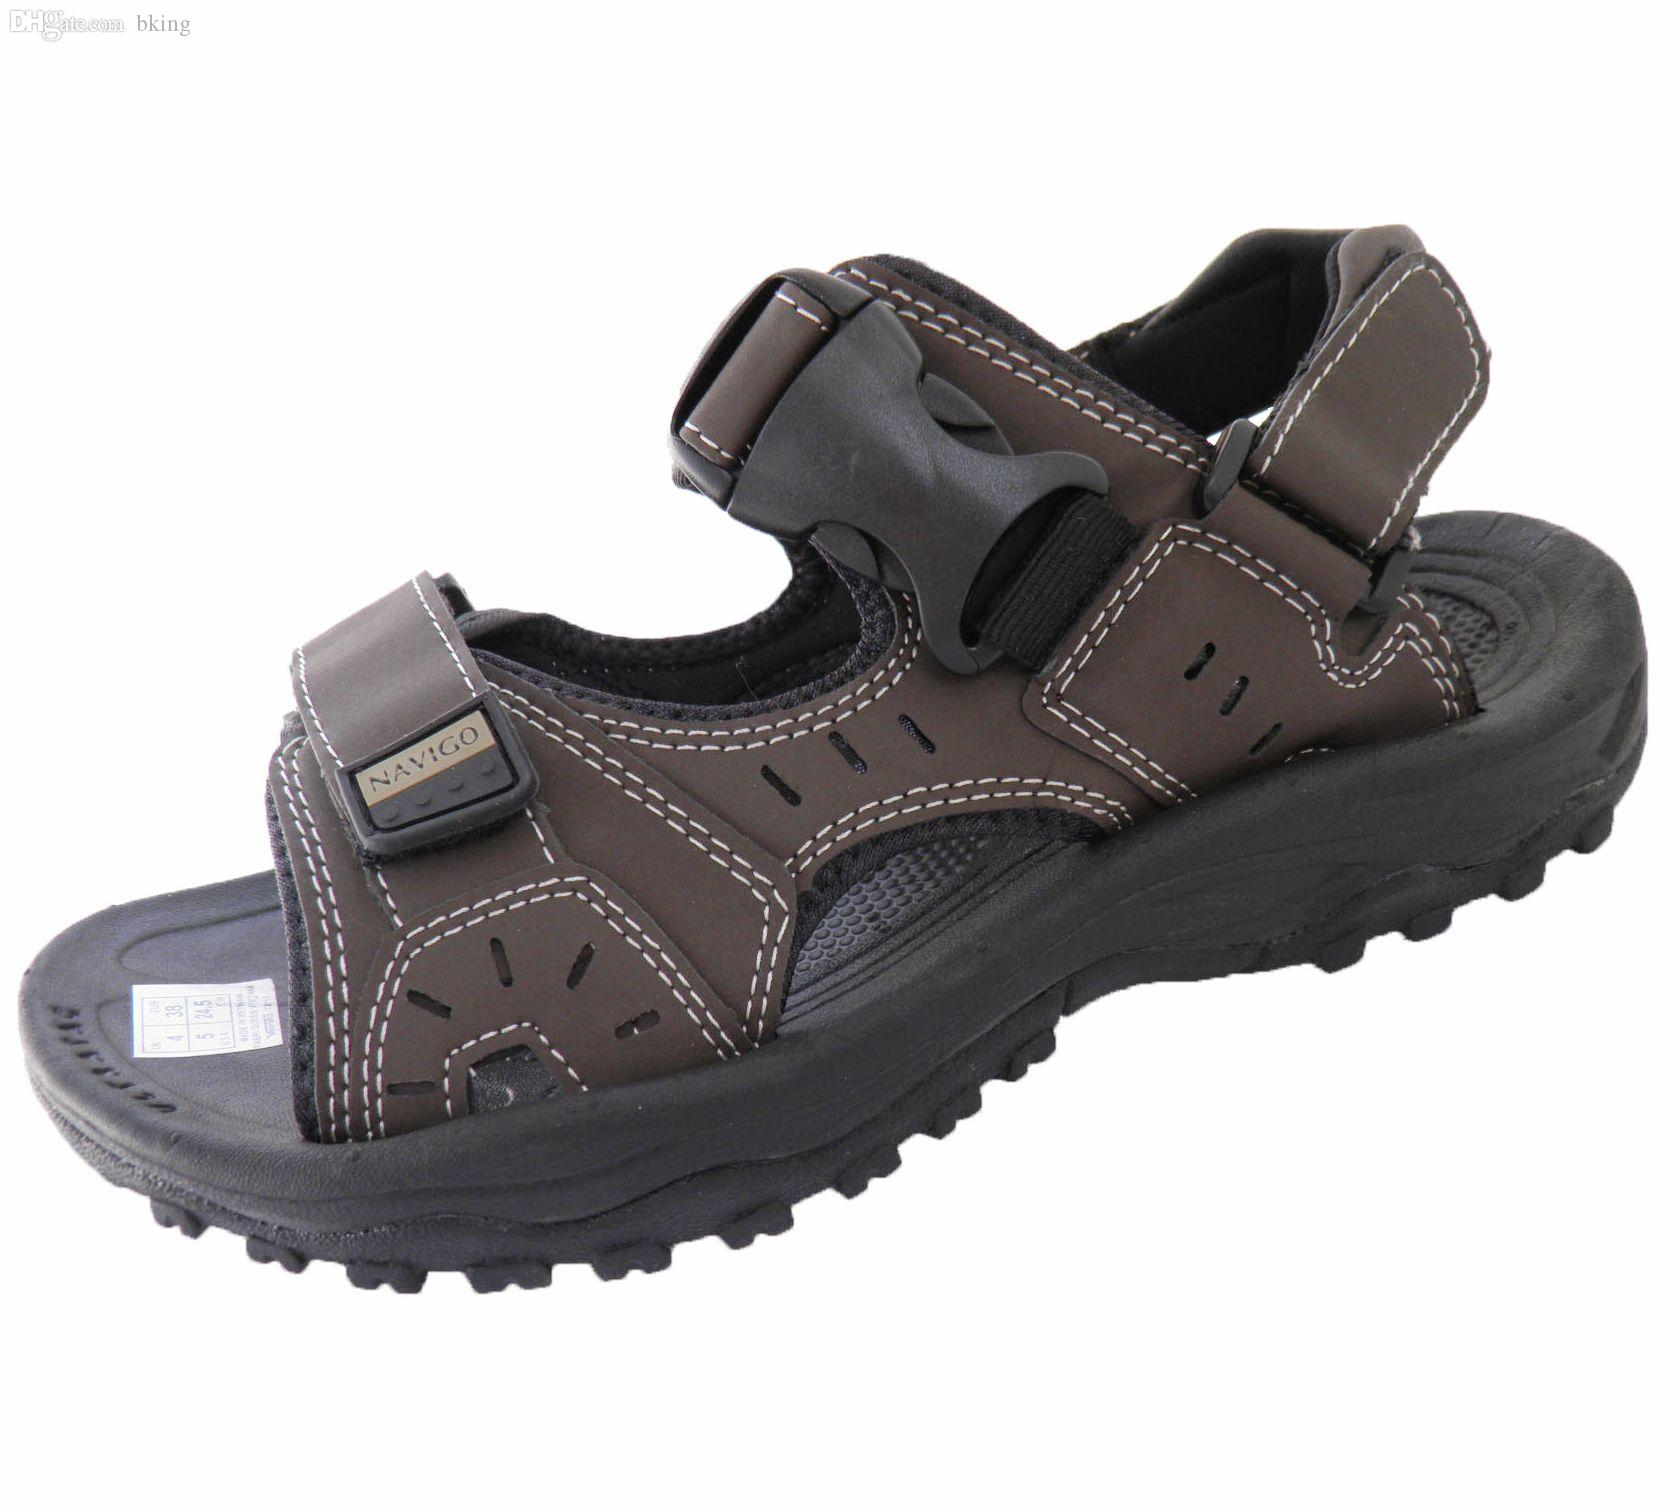 Sandals and shoes wholesale - Wholesale Vietnam Shoes Male Sandals Male Sandals Male Sandals Water Beach Sandals Slip Resistant 901 Blue Shoes Cheap Sandals From Bking 51 11 Dhgate